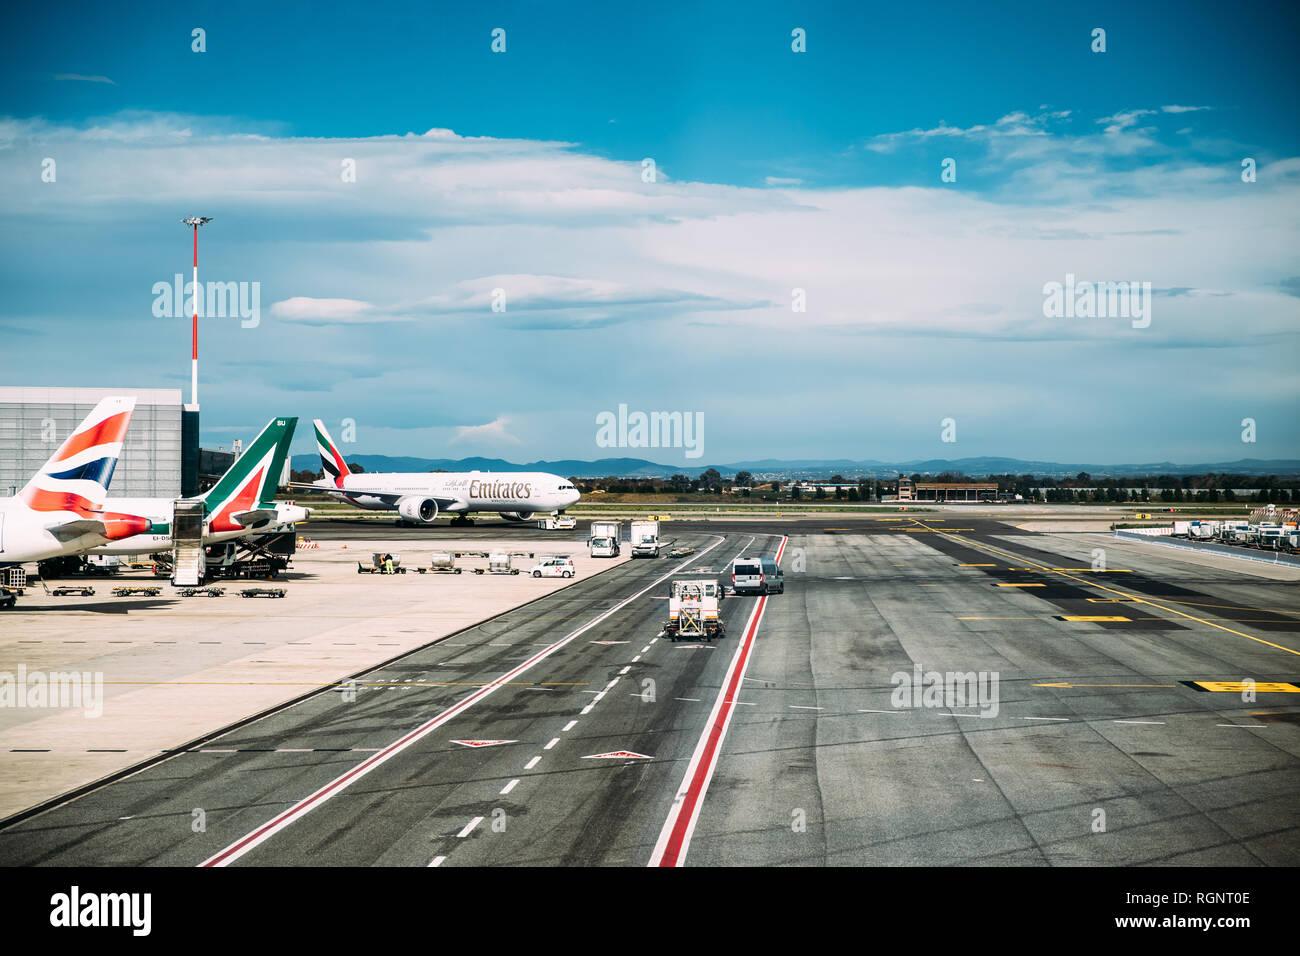 Fiumicino, Italy - October 22, 2018: Aircraft Plane Of Emirates Airlines Stand At Rome–Fiumicino International Airport 'Leonardo Da Vinci' In Autumn D - Stock Image